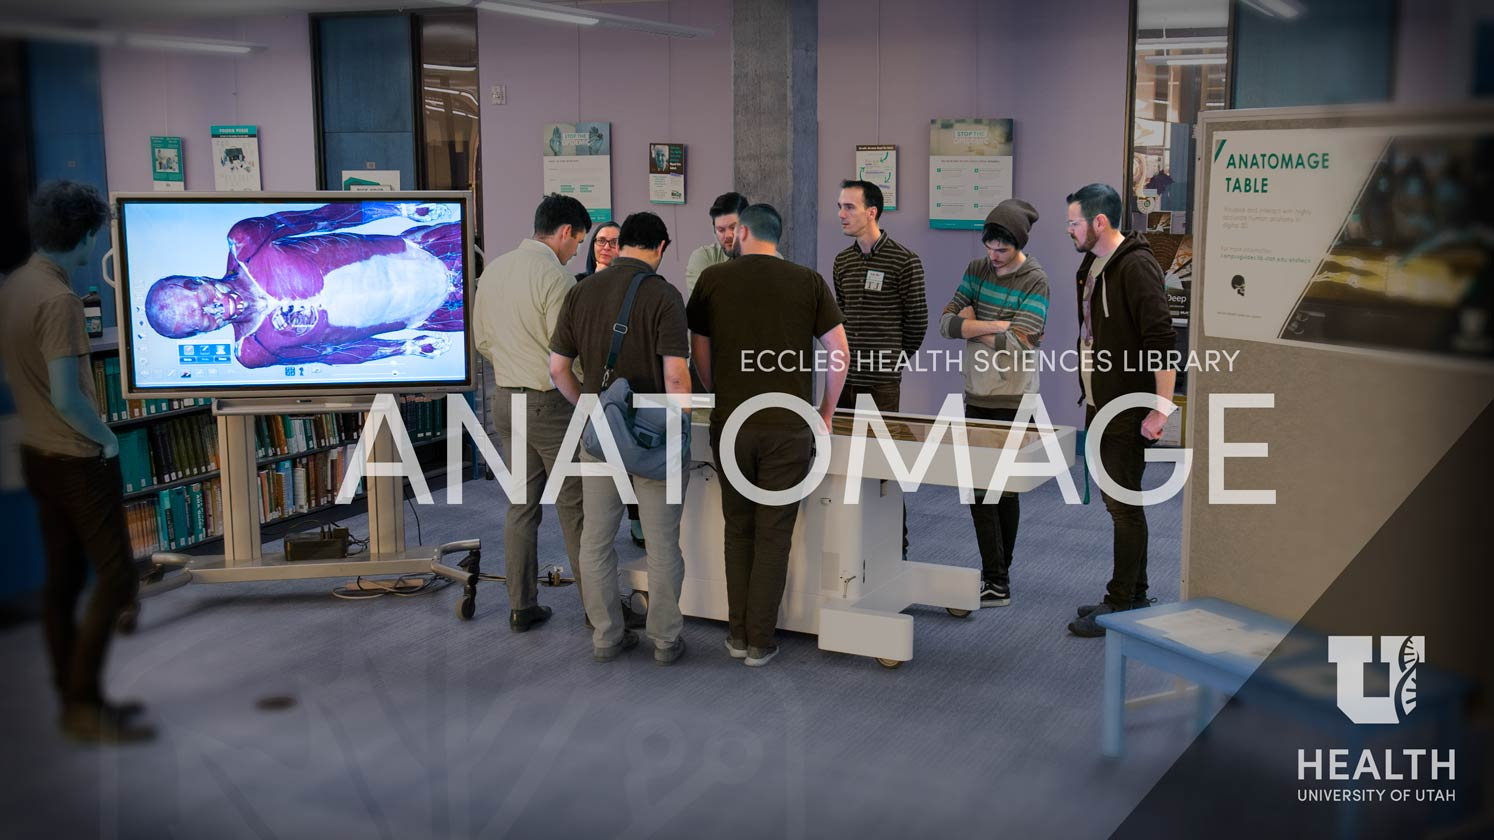 Anatomage